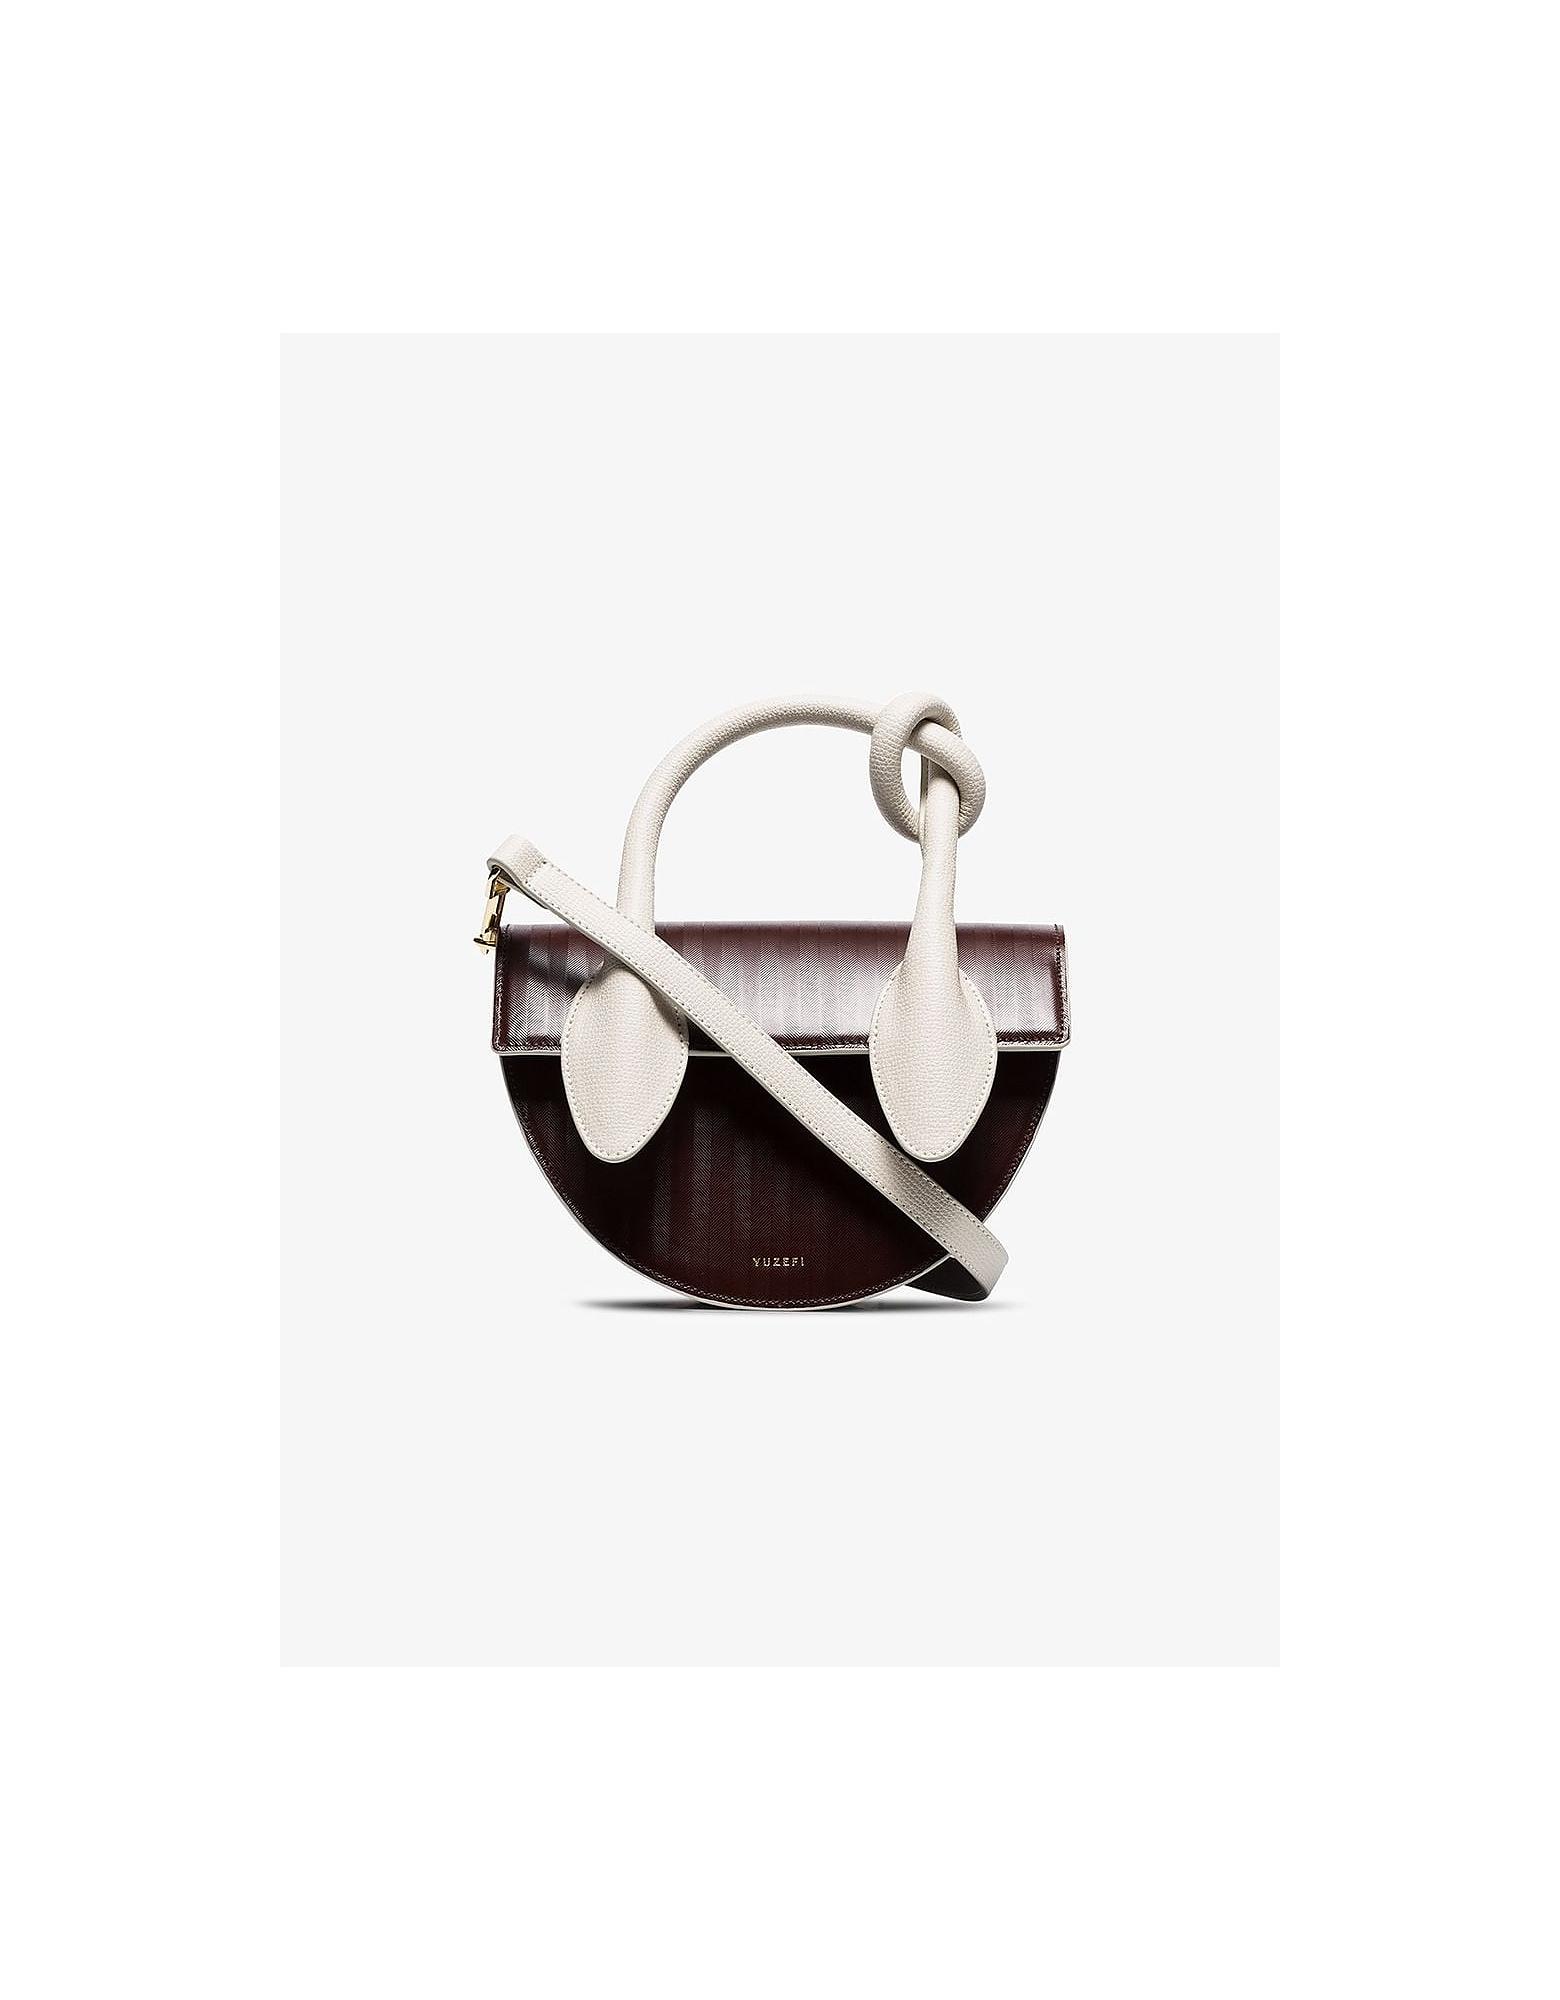 Yuzefi Designer Handbags, Brown & White Dolores Herringbone Leather Shoulder Bag